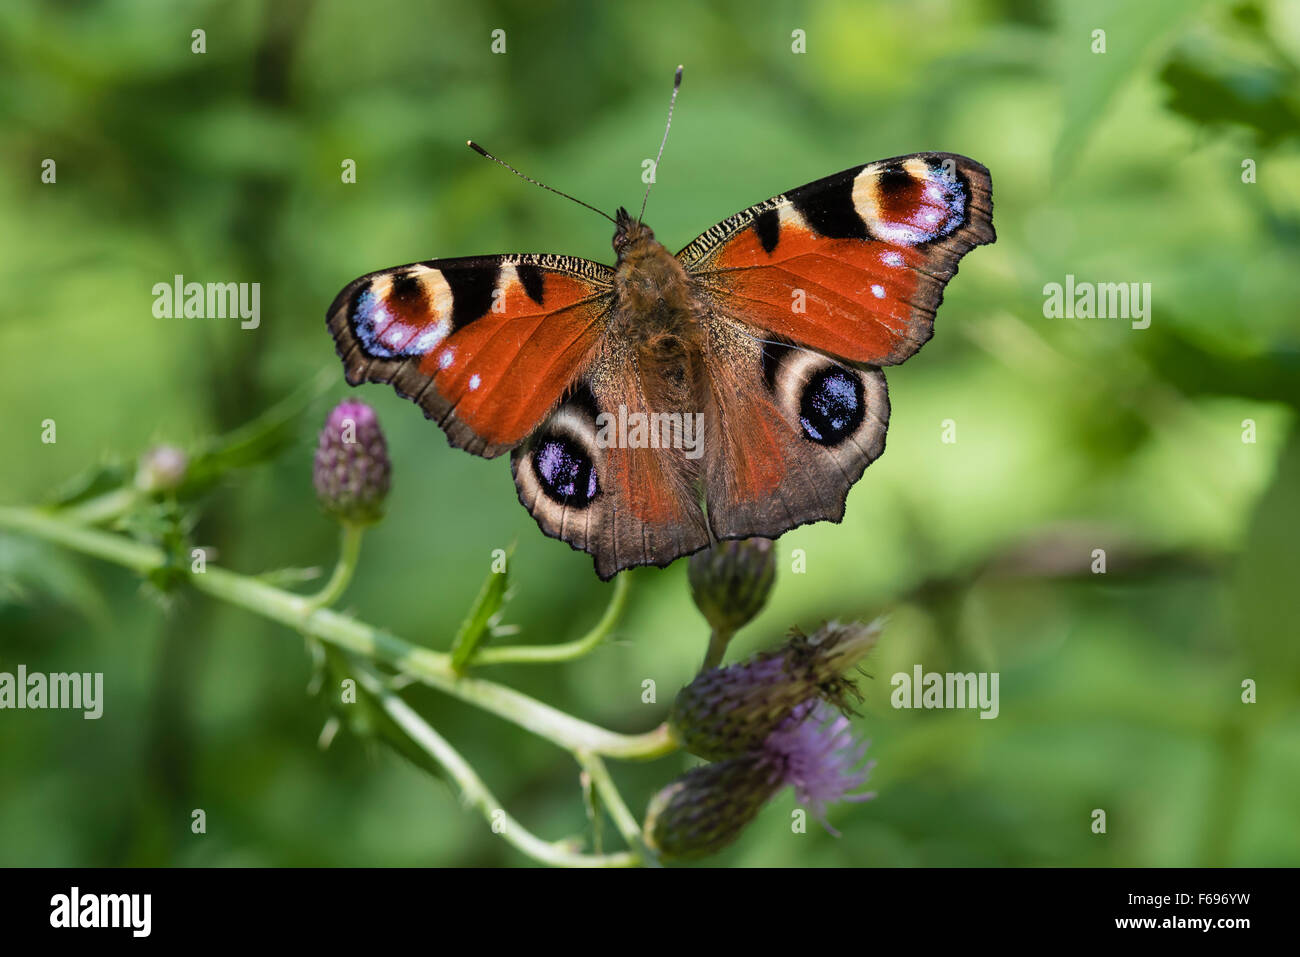 Tagpfauenauge, Aglais io, European peacock butterfly - Stock Image